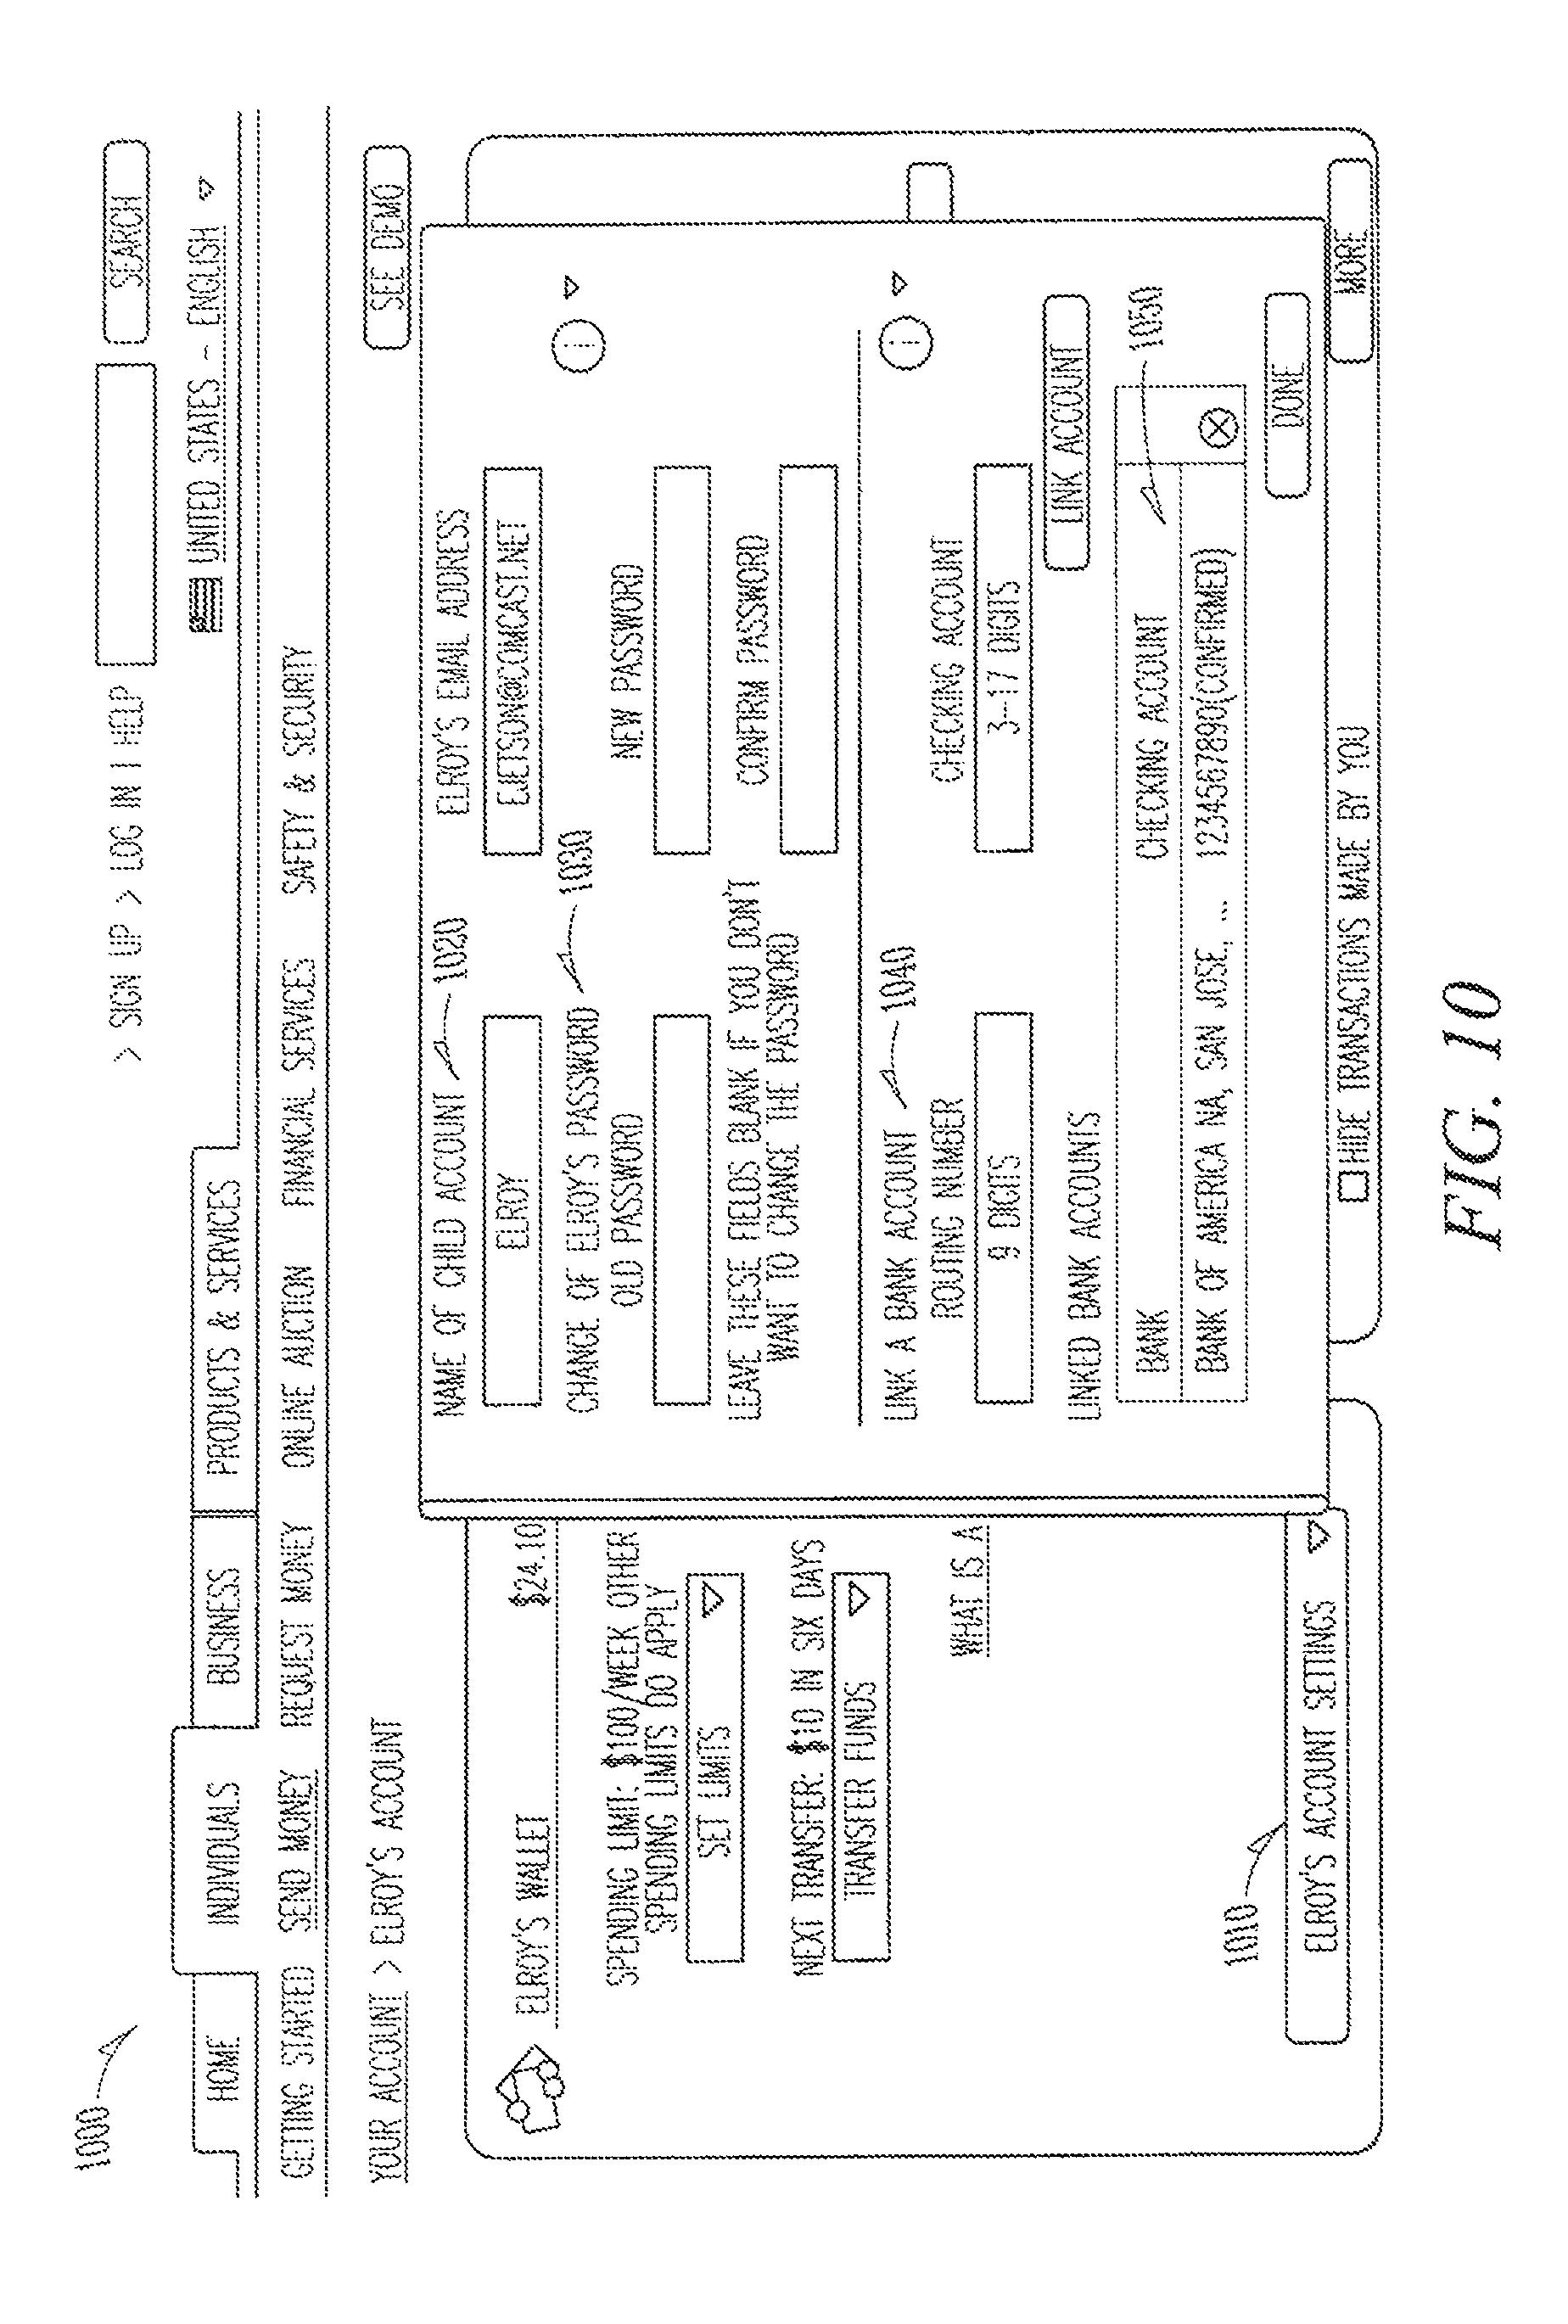 Patent US 8,732,076 B2